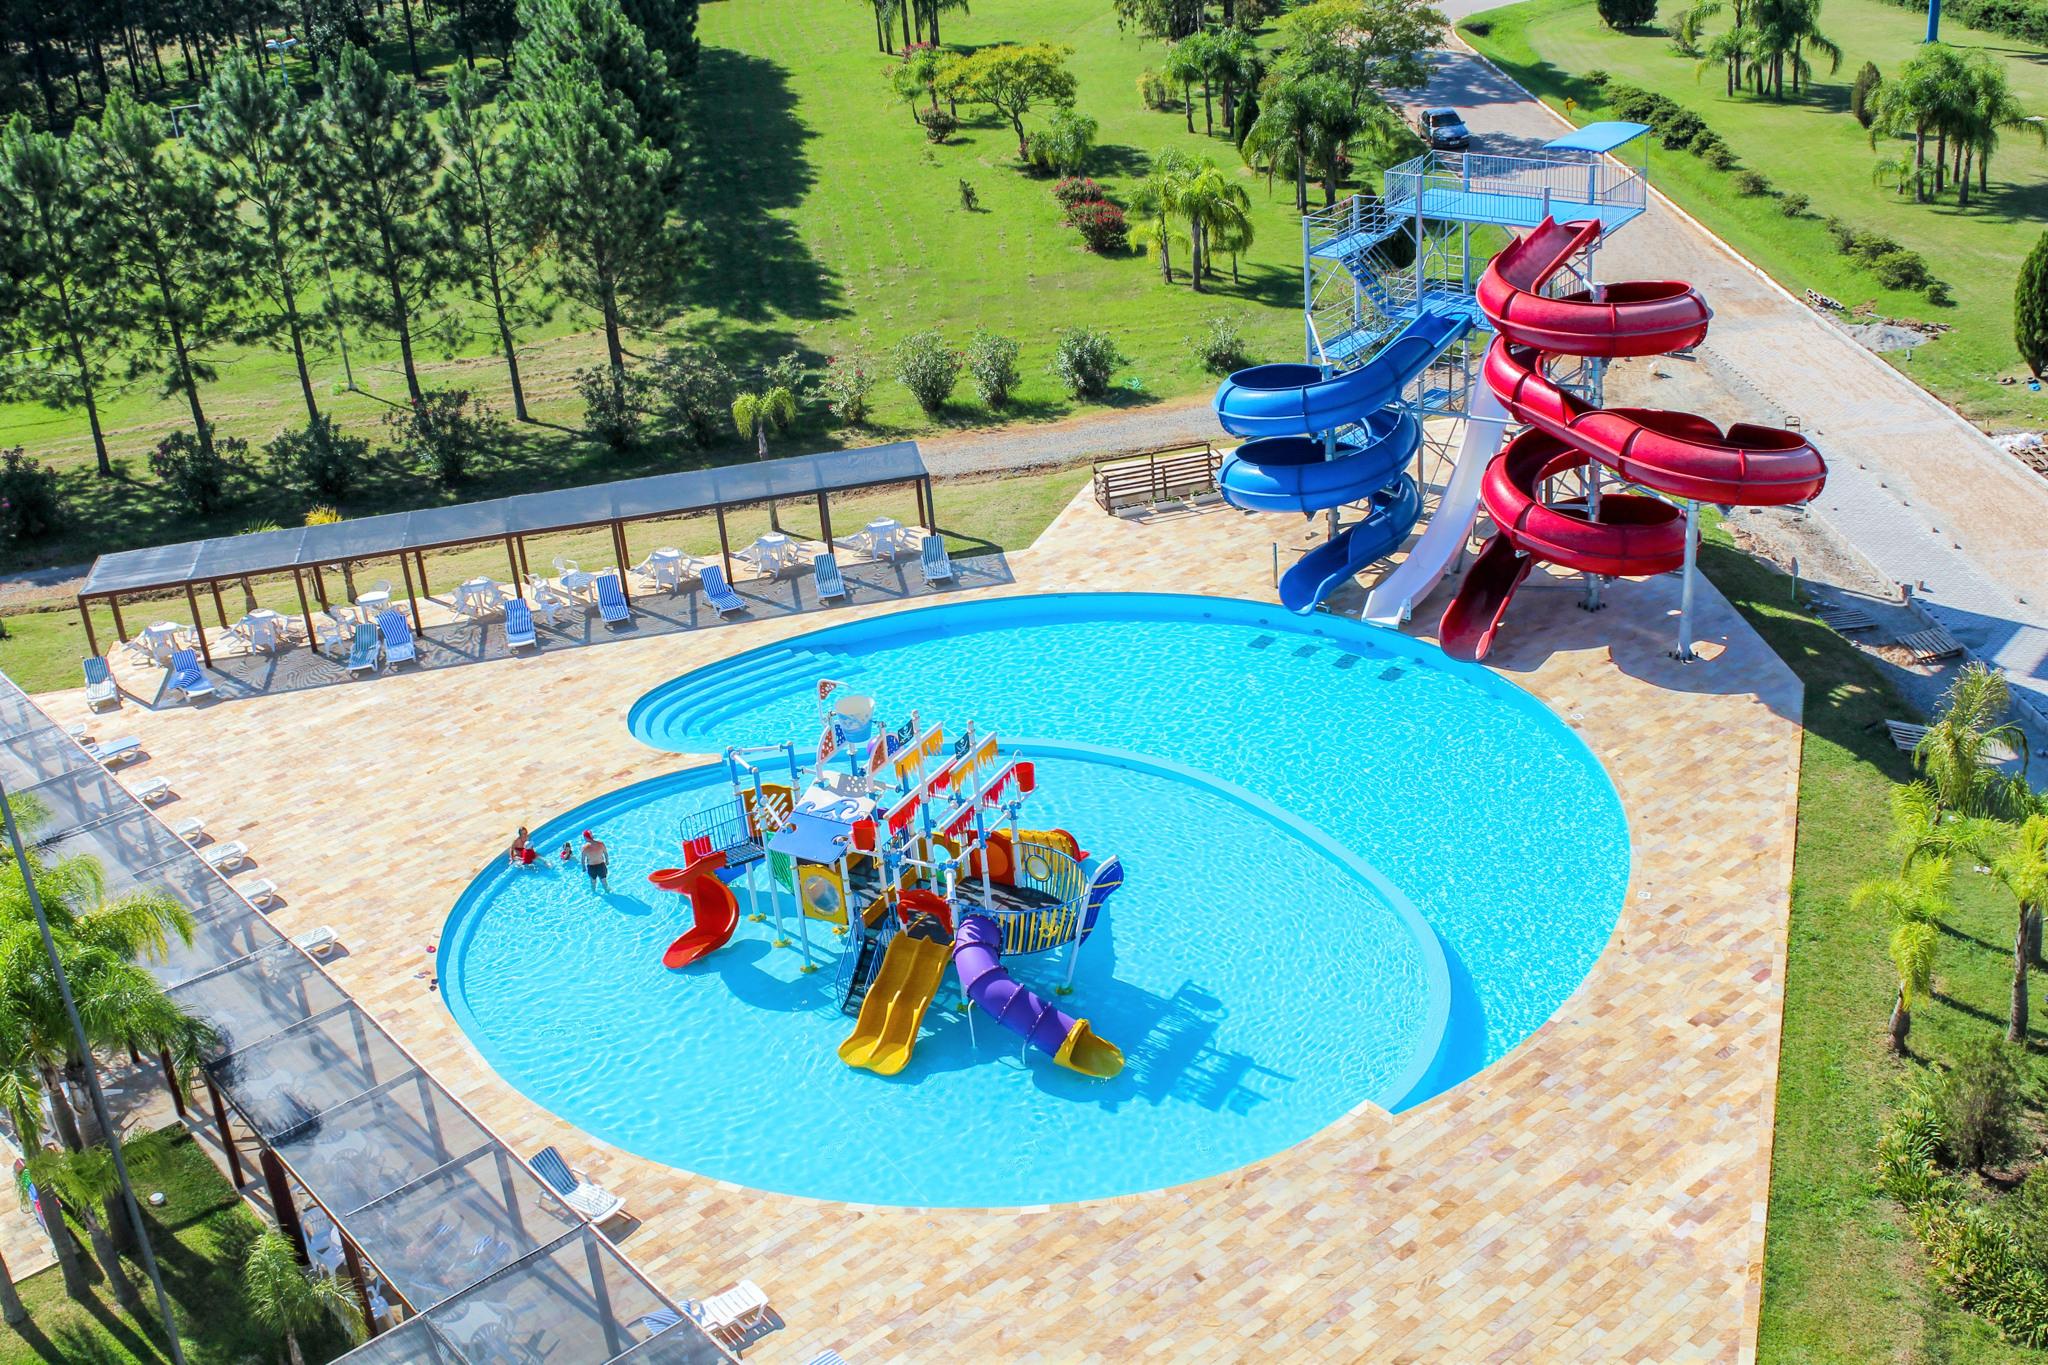 Lazer_-_Hotel_San_Isidro_-_São_Gabriel_(